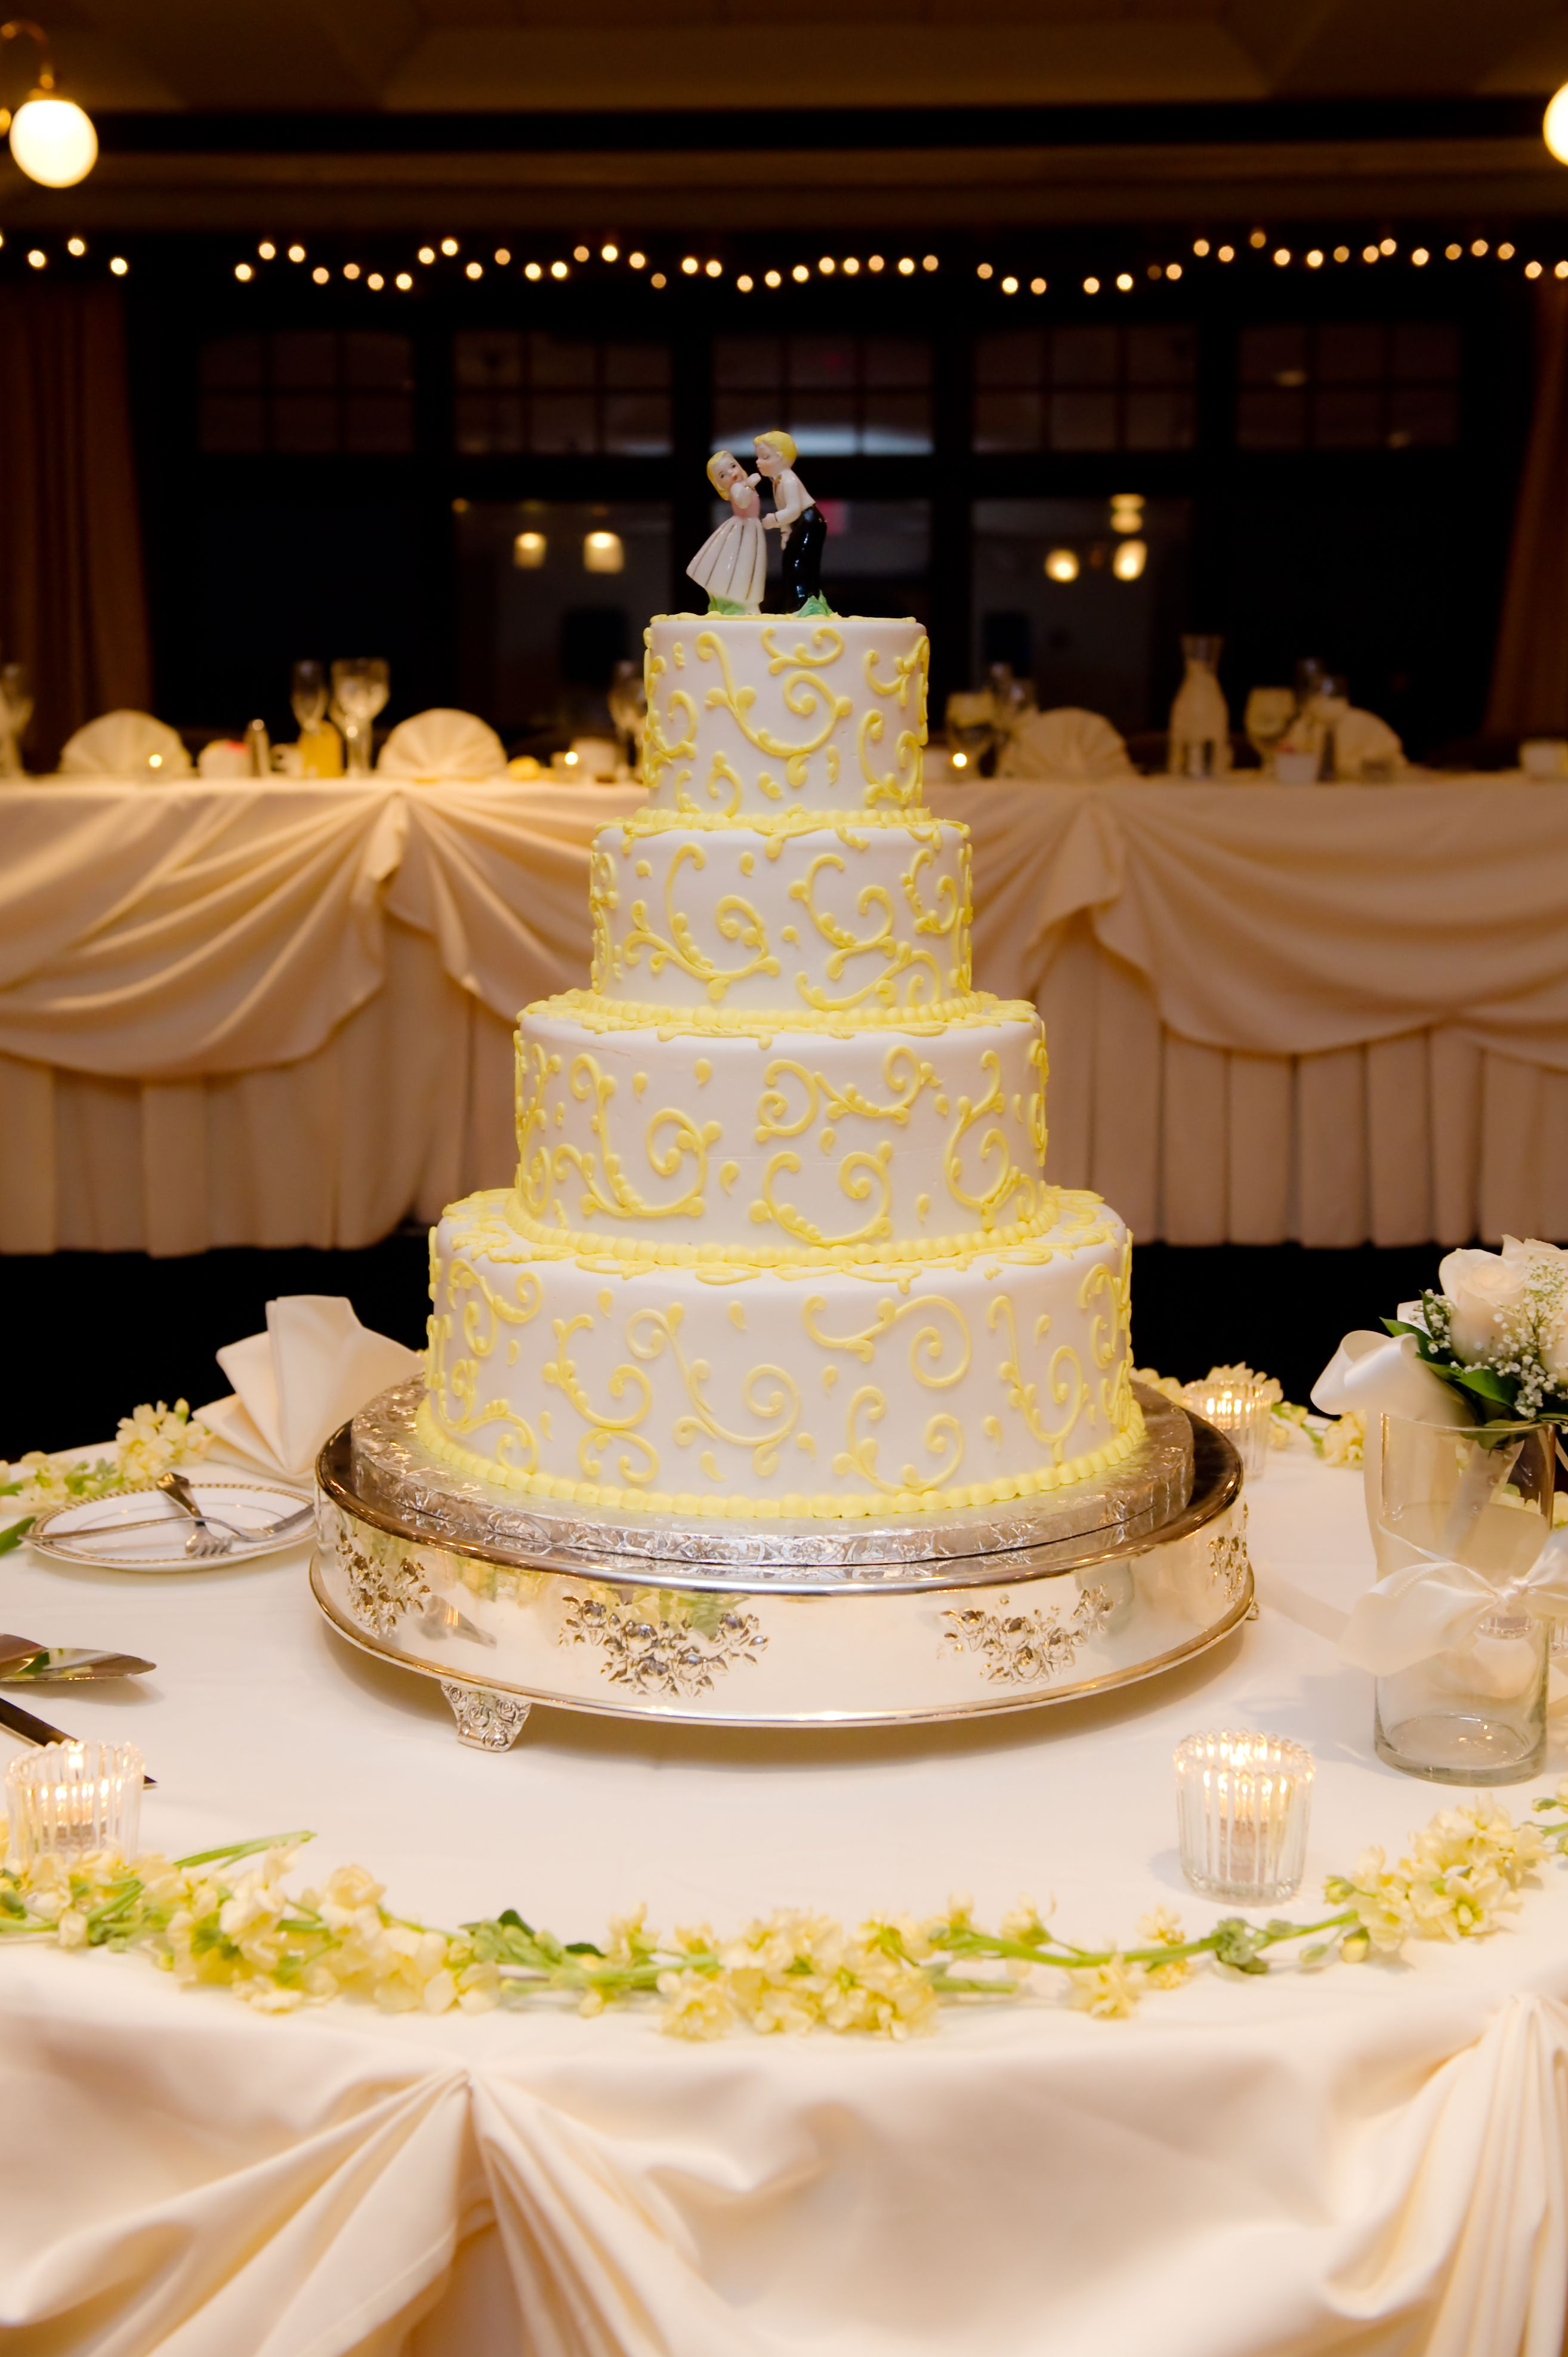 Yellow Paisley Wedding Cake Continental Bakery | Our Wedding ...